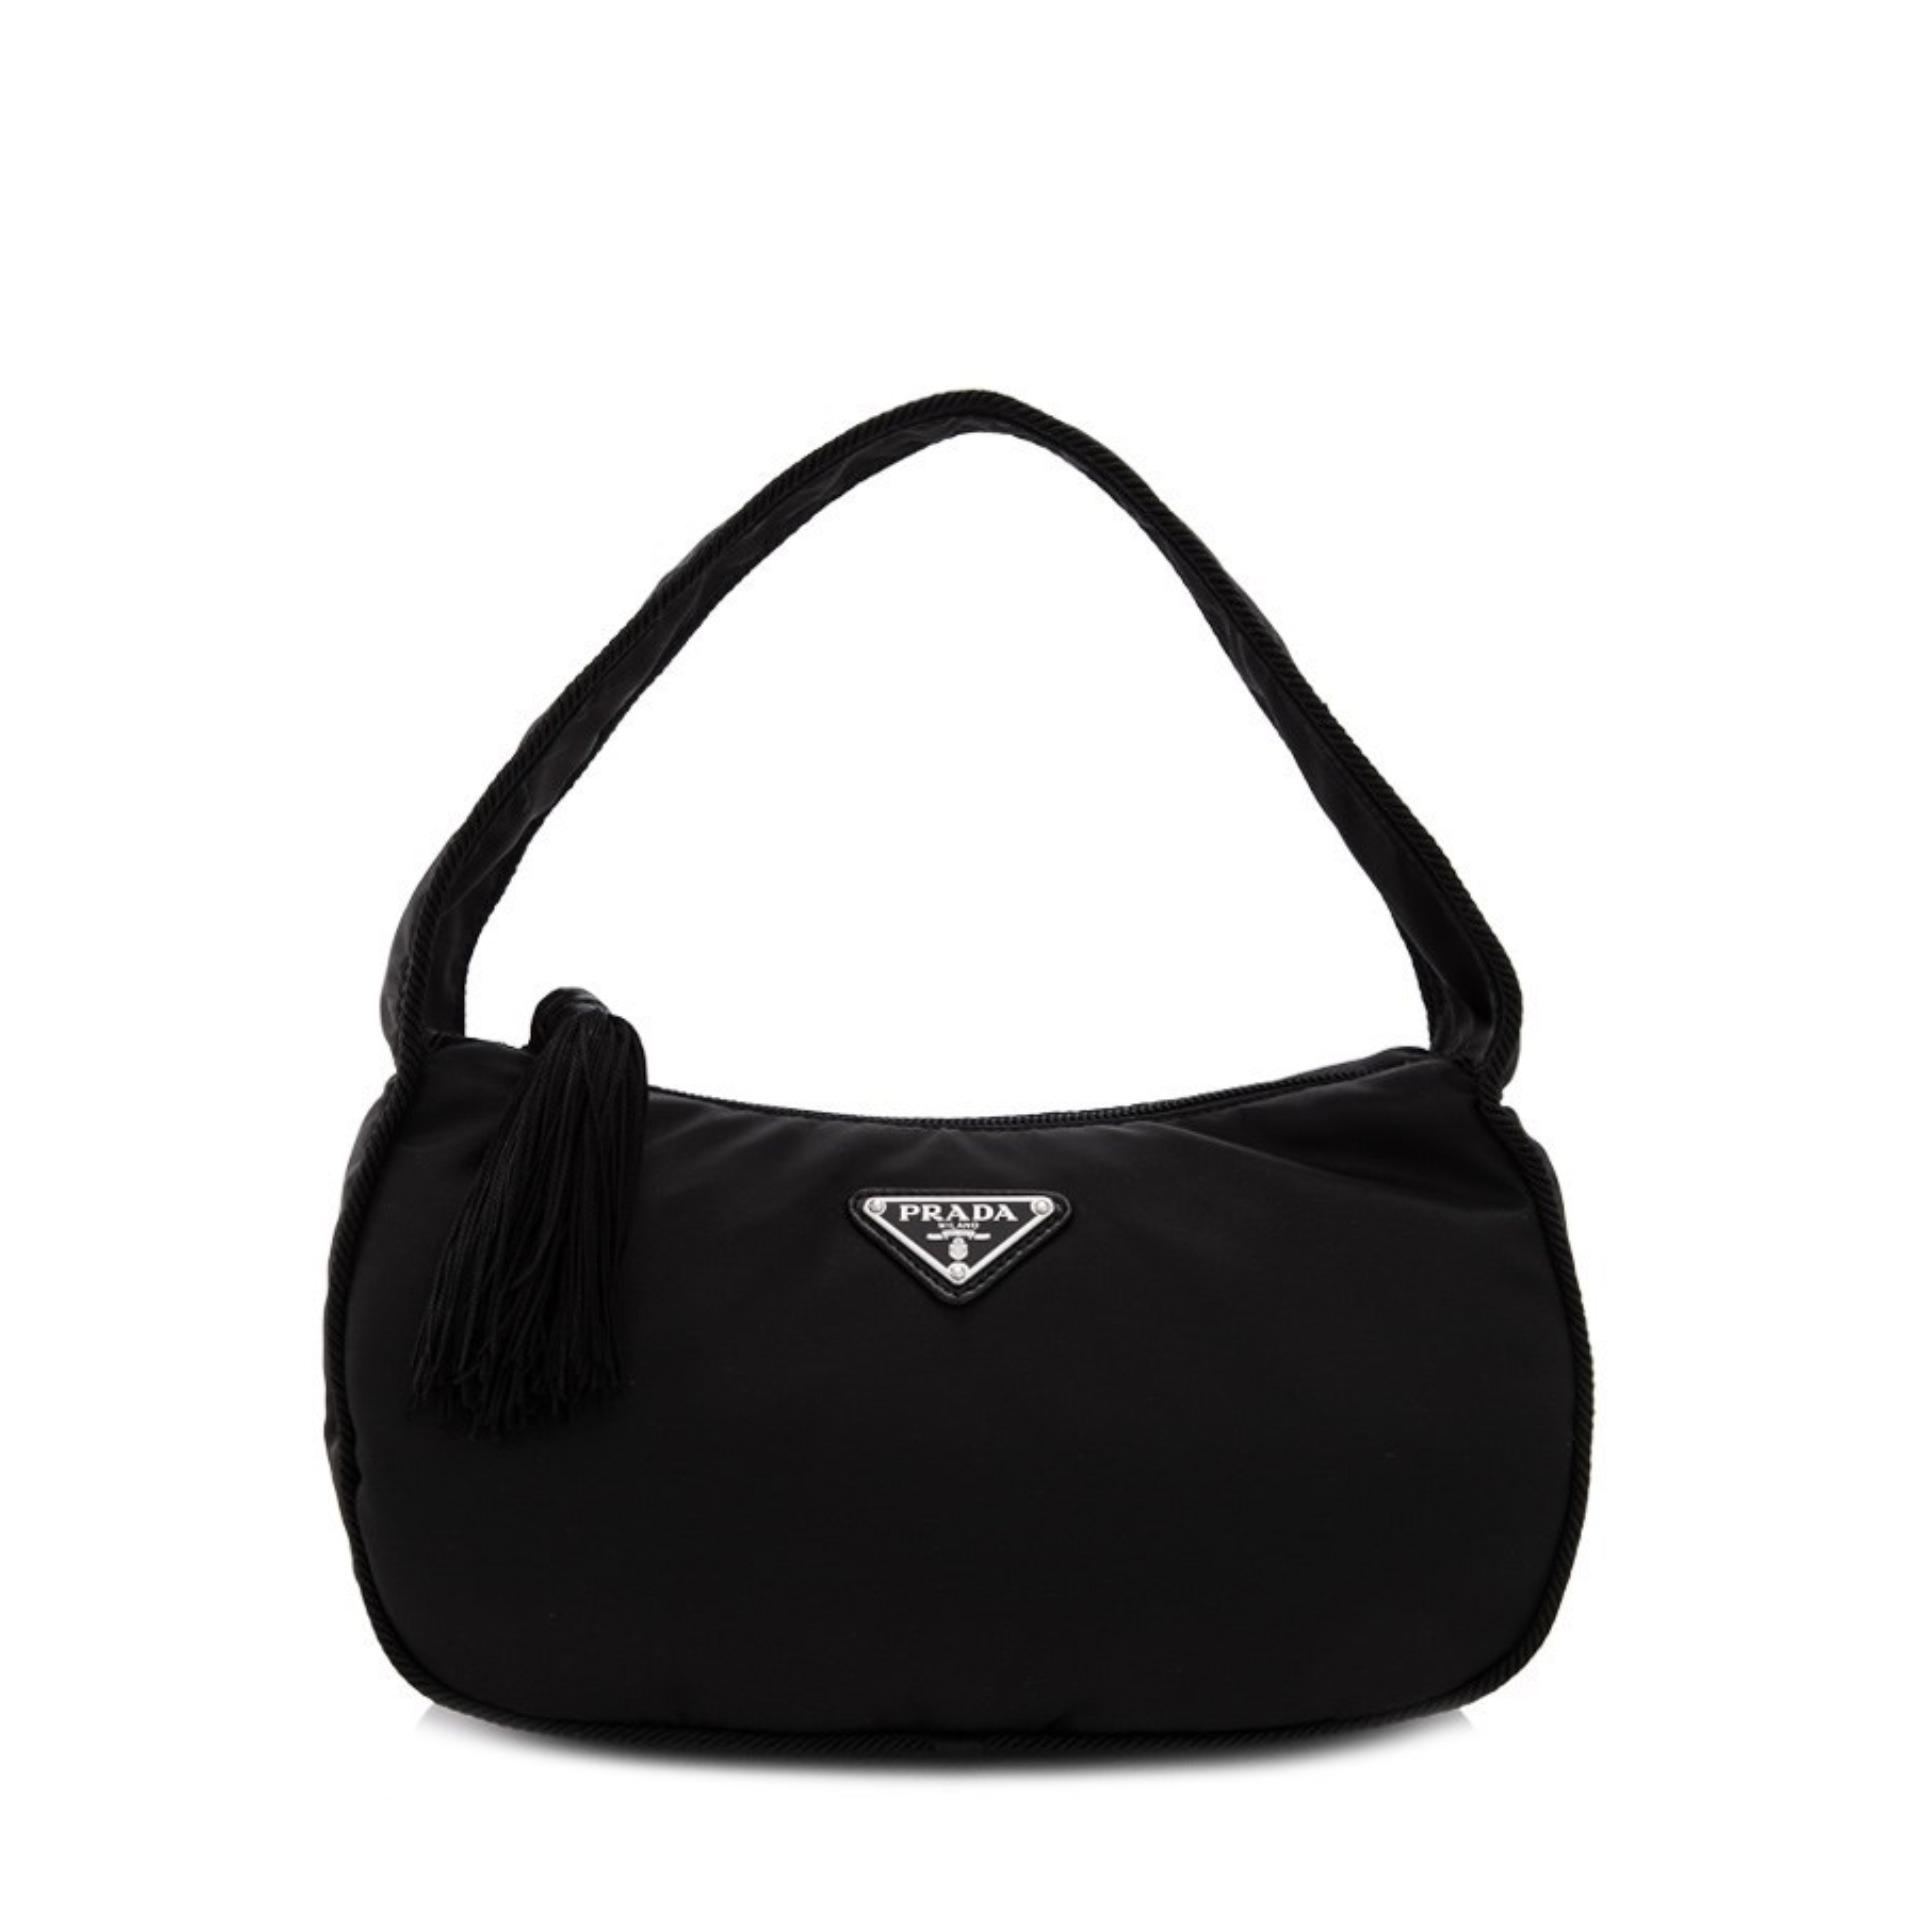 5cc2b04c7283 Prada Tessuto Passama Handbag (Nero) # 1BA8702A6SF0002